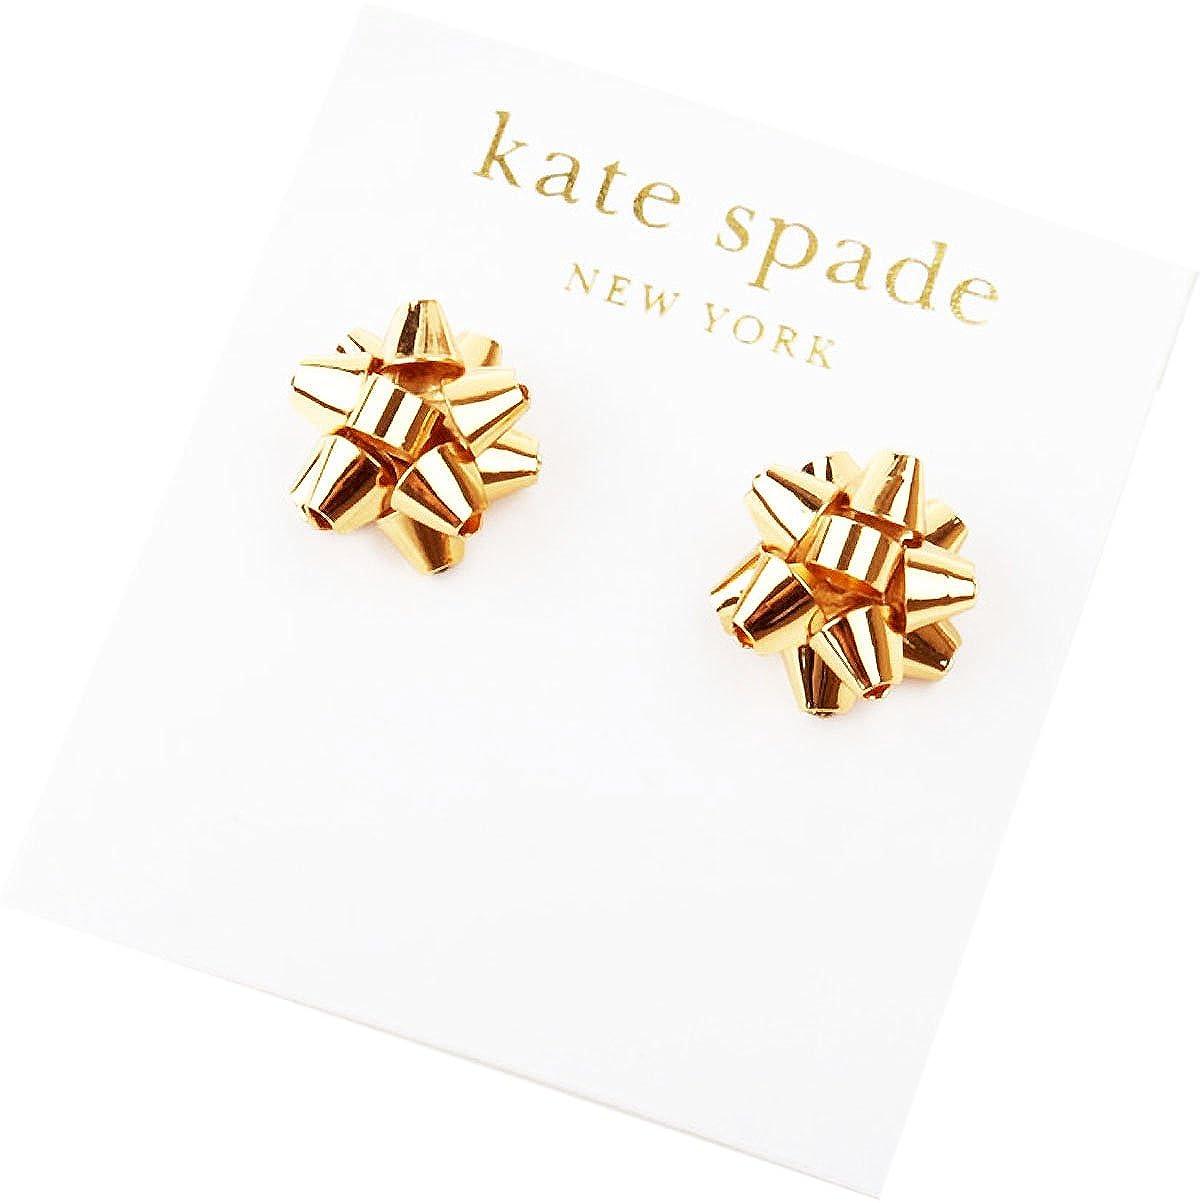 Amazon.com: Kate Spade Bourgeois Bow Earring Studs Gold: Jewelry